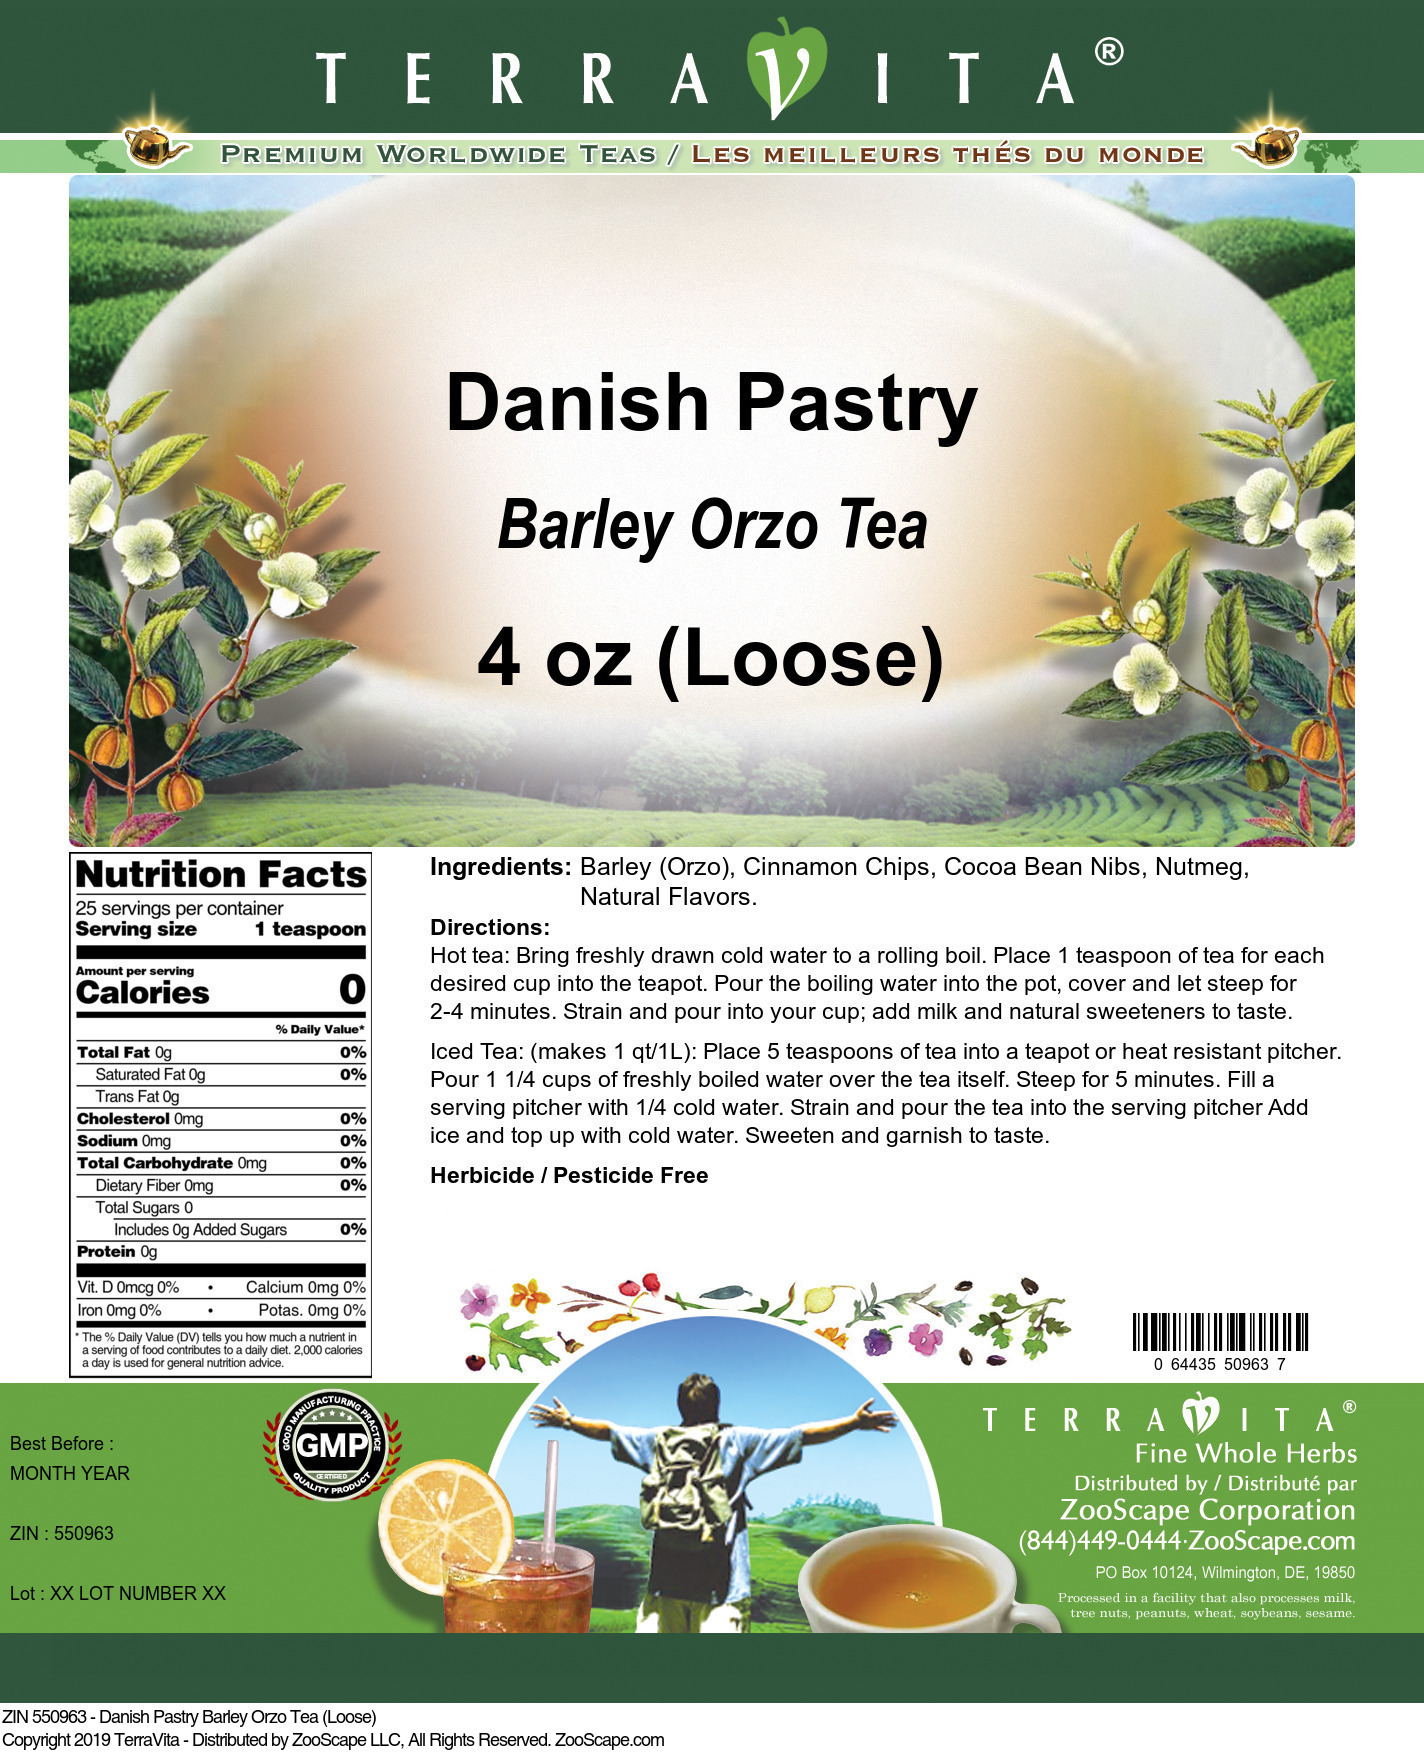 Danish Pastry Barley Orzo Tea (Loose)